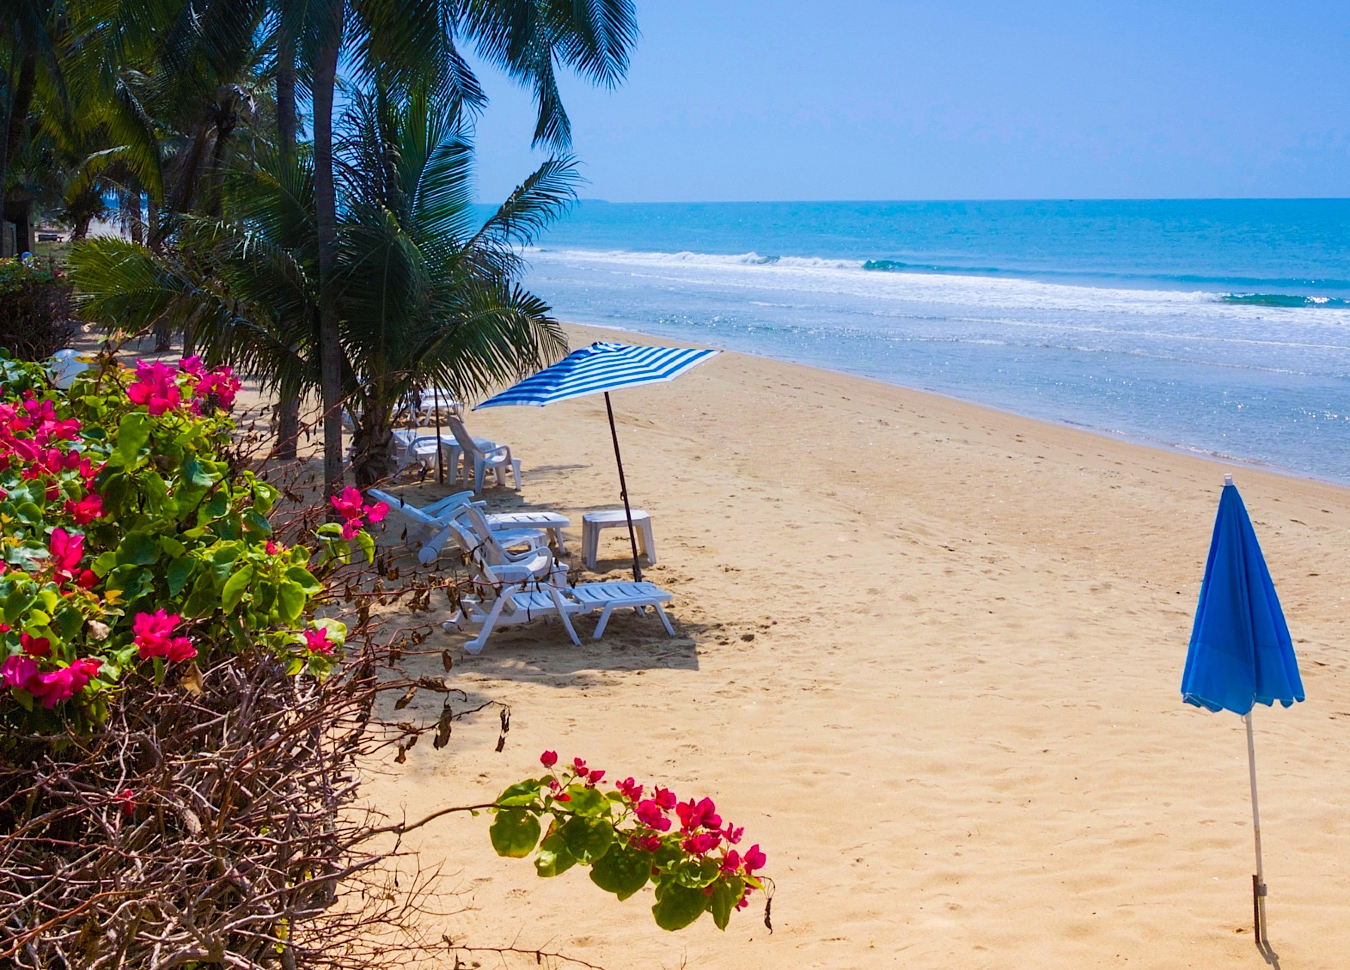 Natural-Villas-Front-Samet-Beach-House-Book-Now-MOBILE-Header-Image